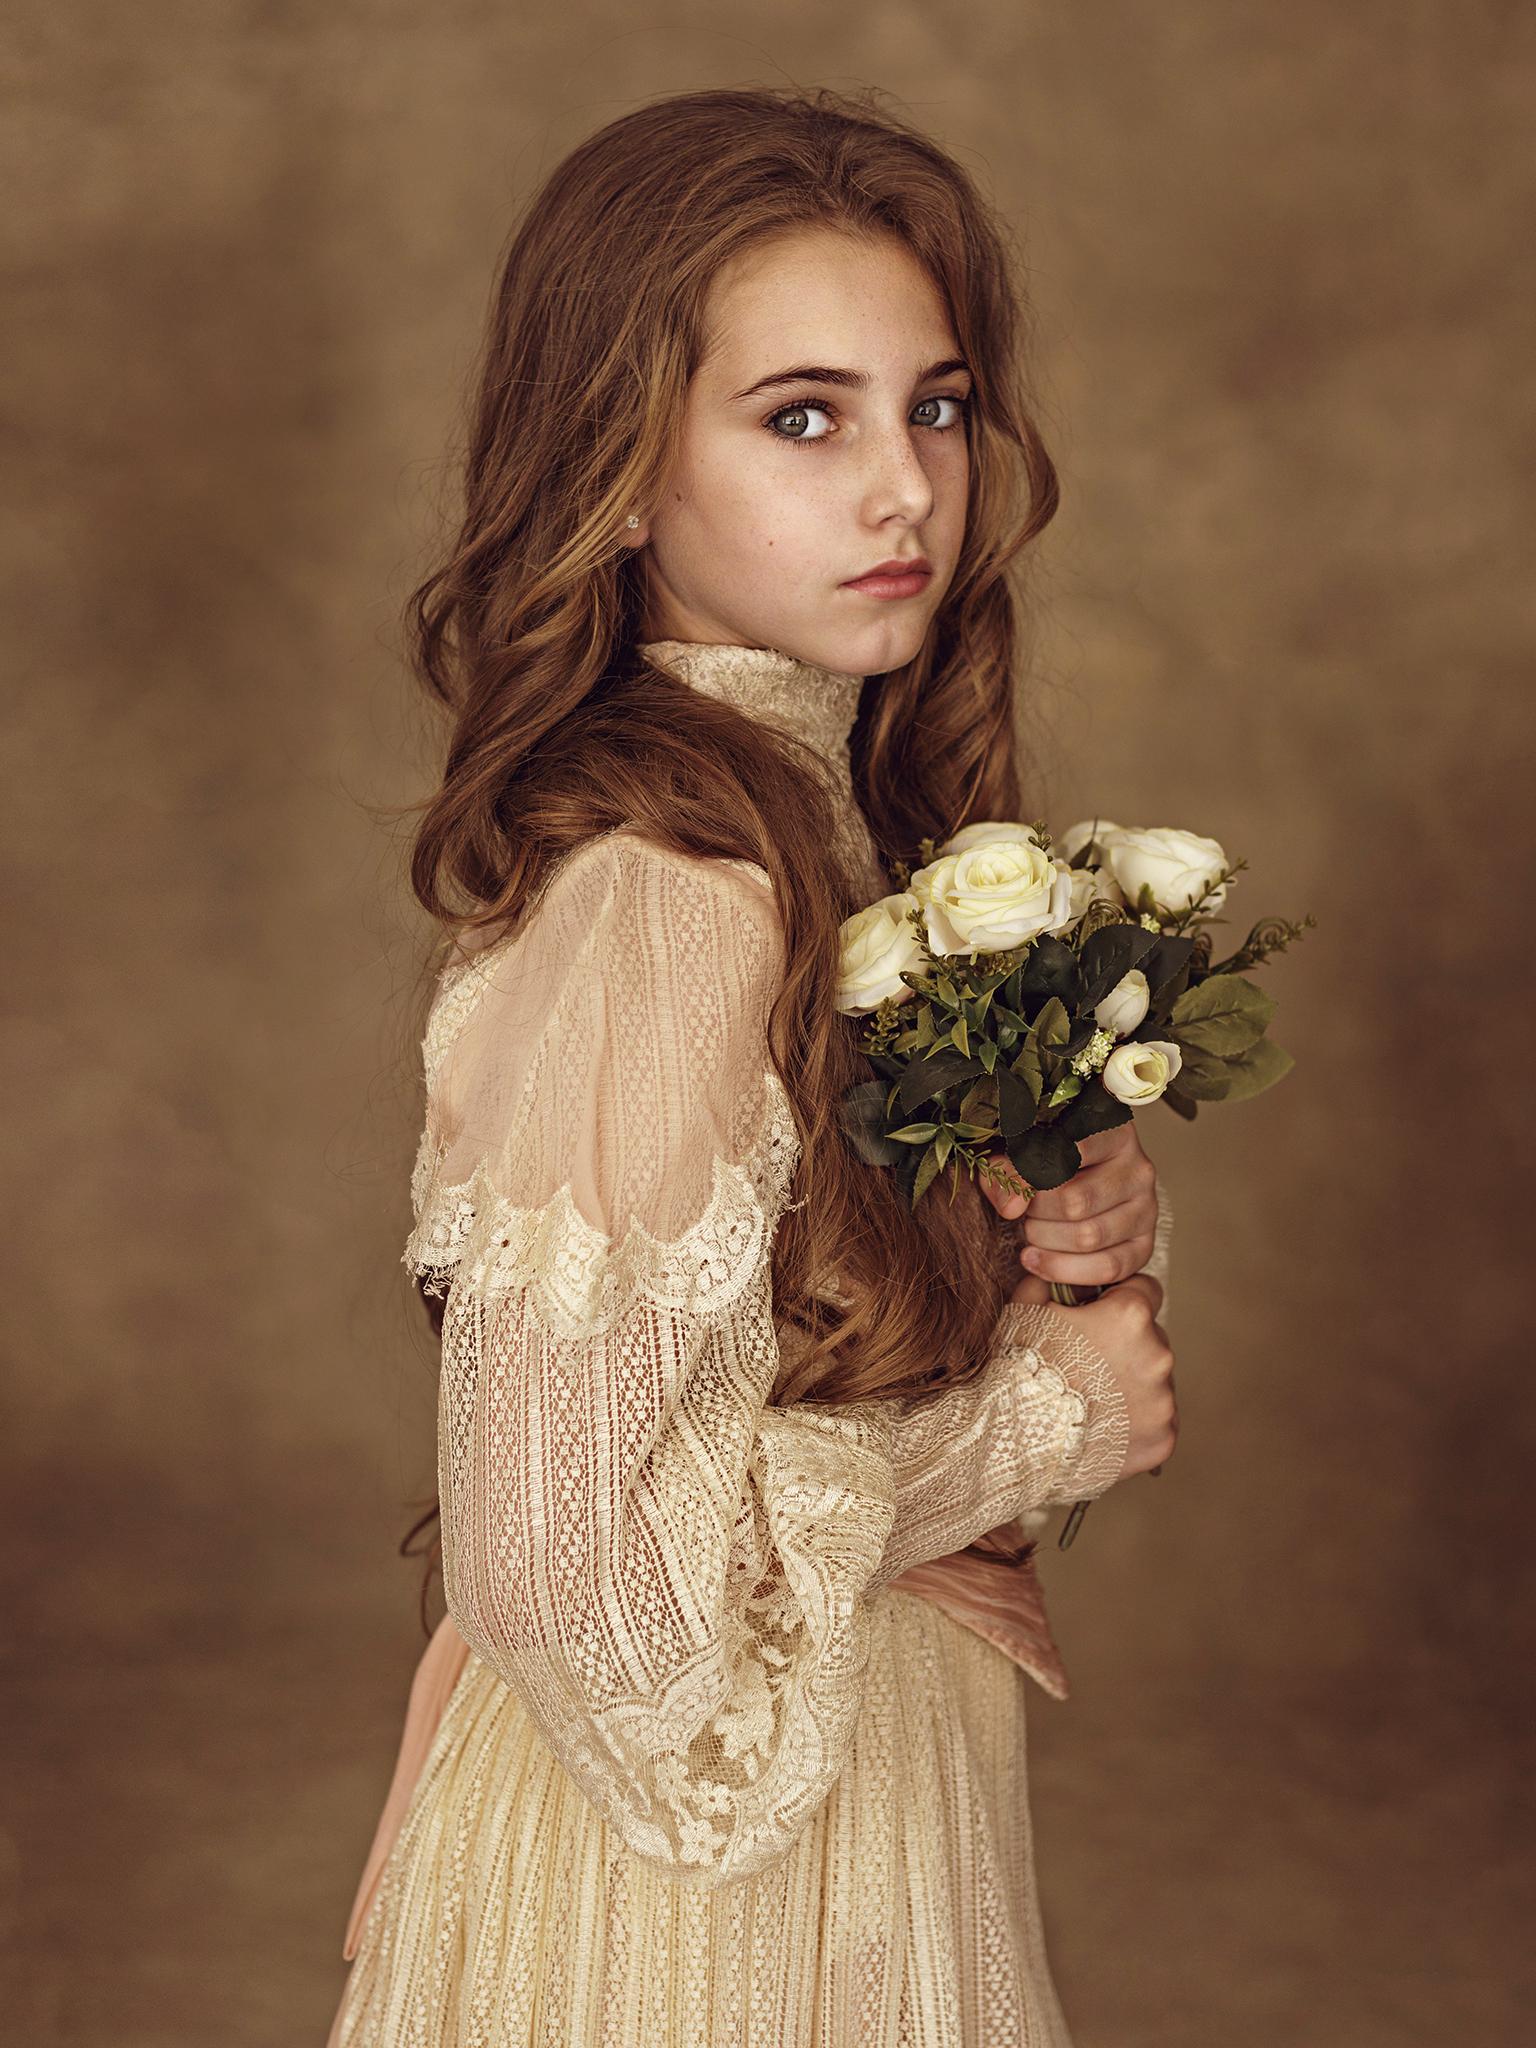 Michael Stief Childrens Photography 3.jpg